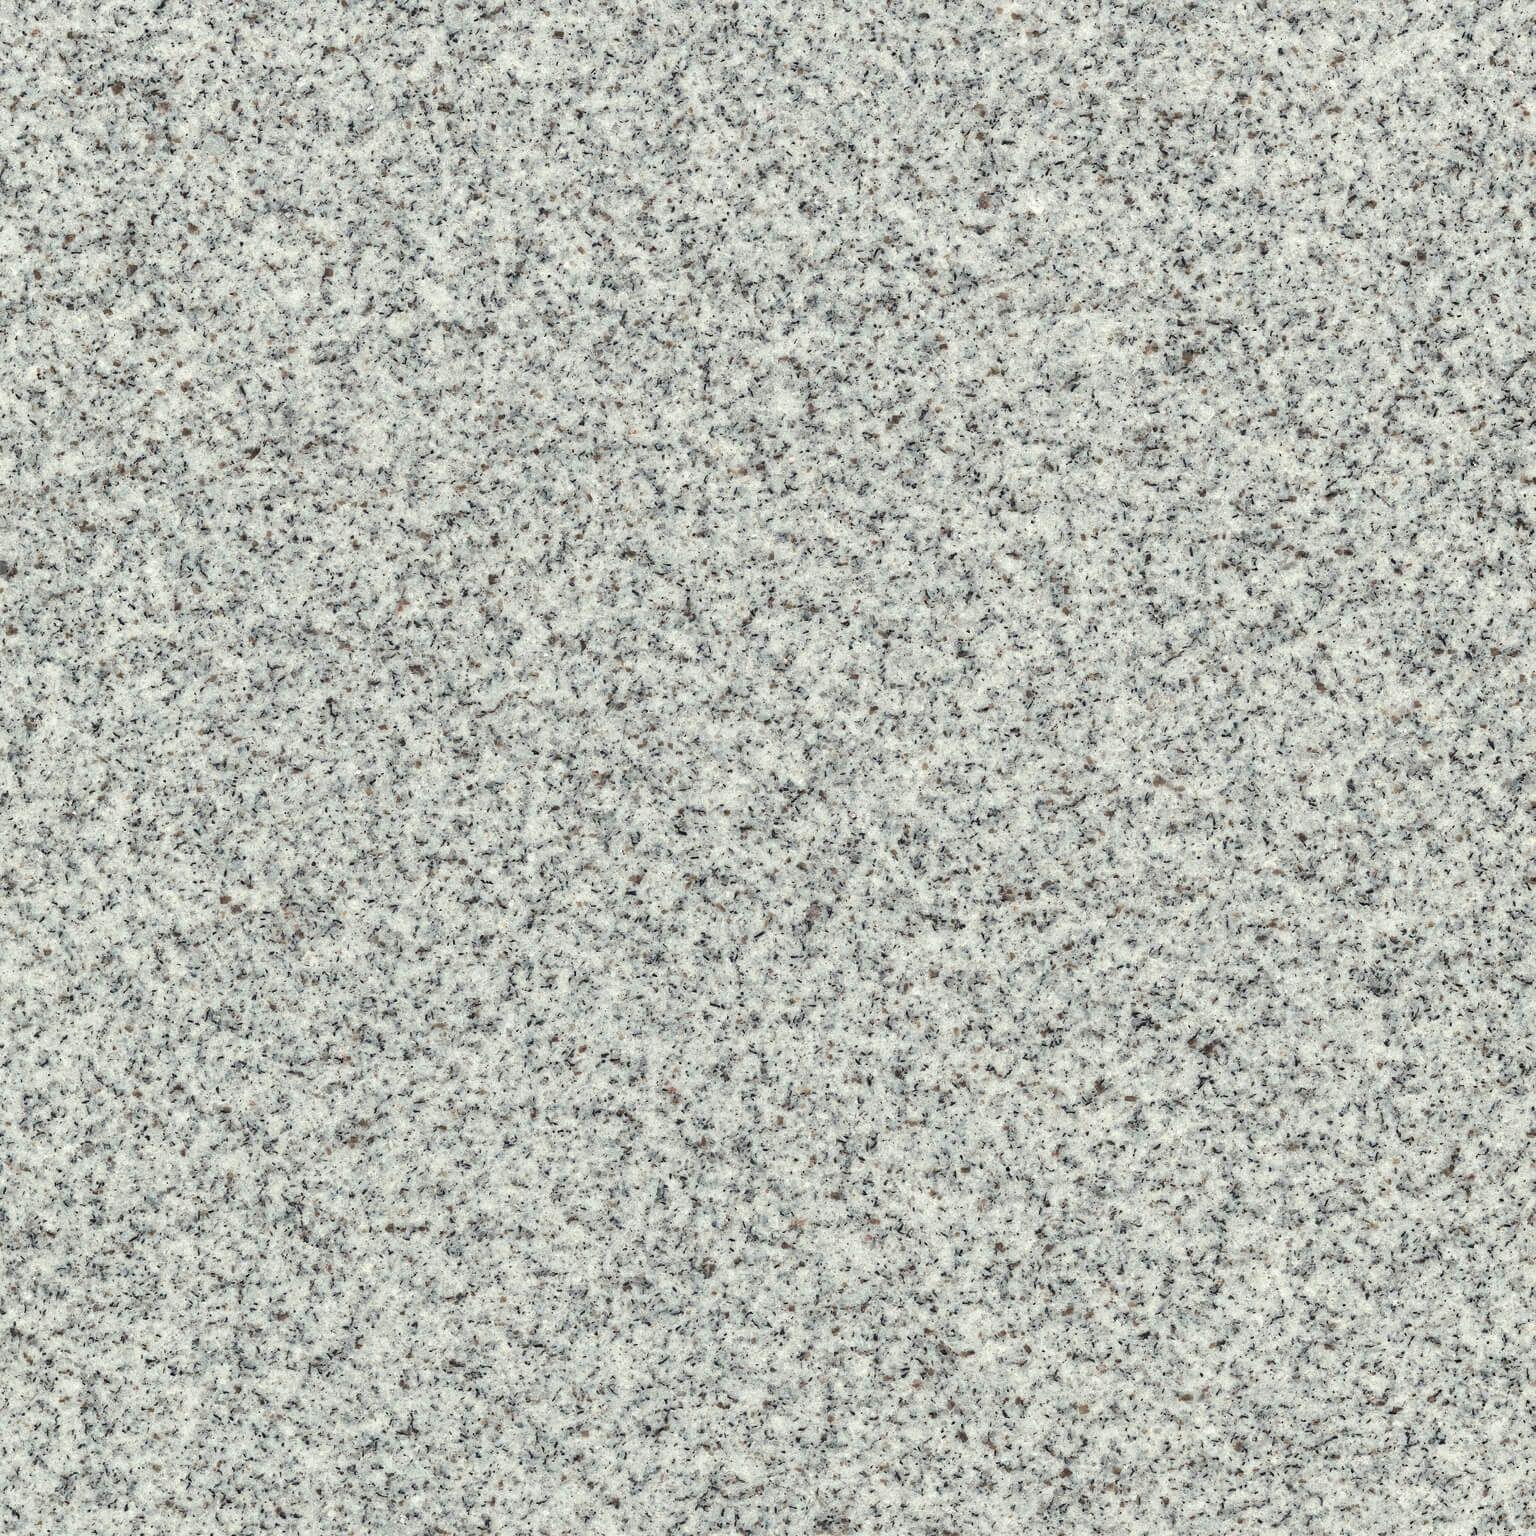 Jay Whitetm Granite Polycor Natural Stone North America Granite White Granite Grey Granite